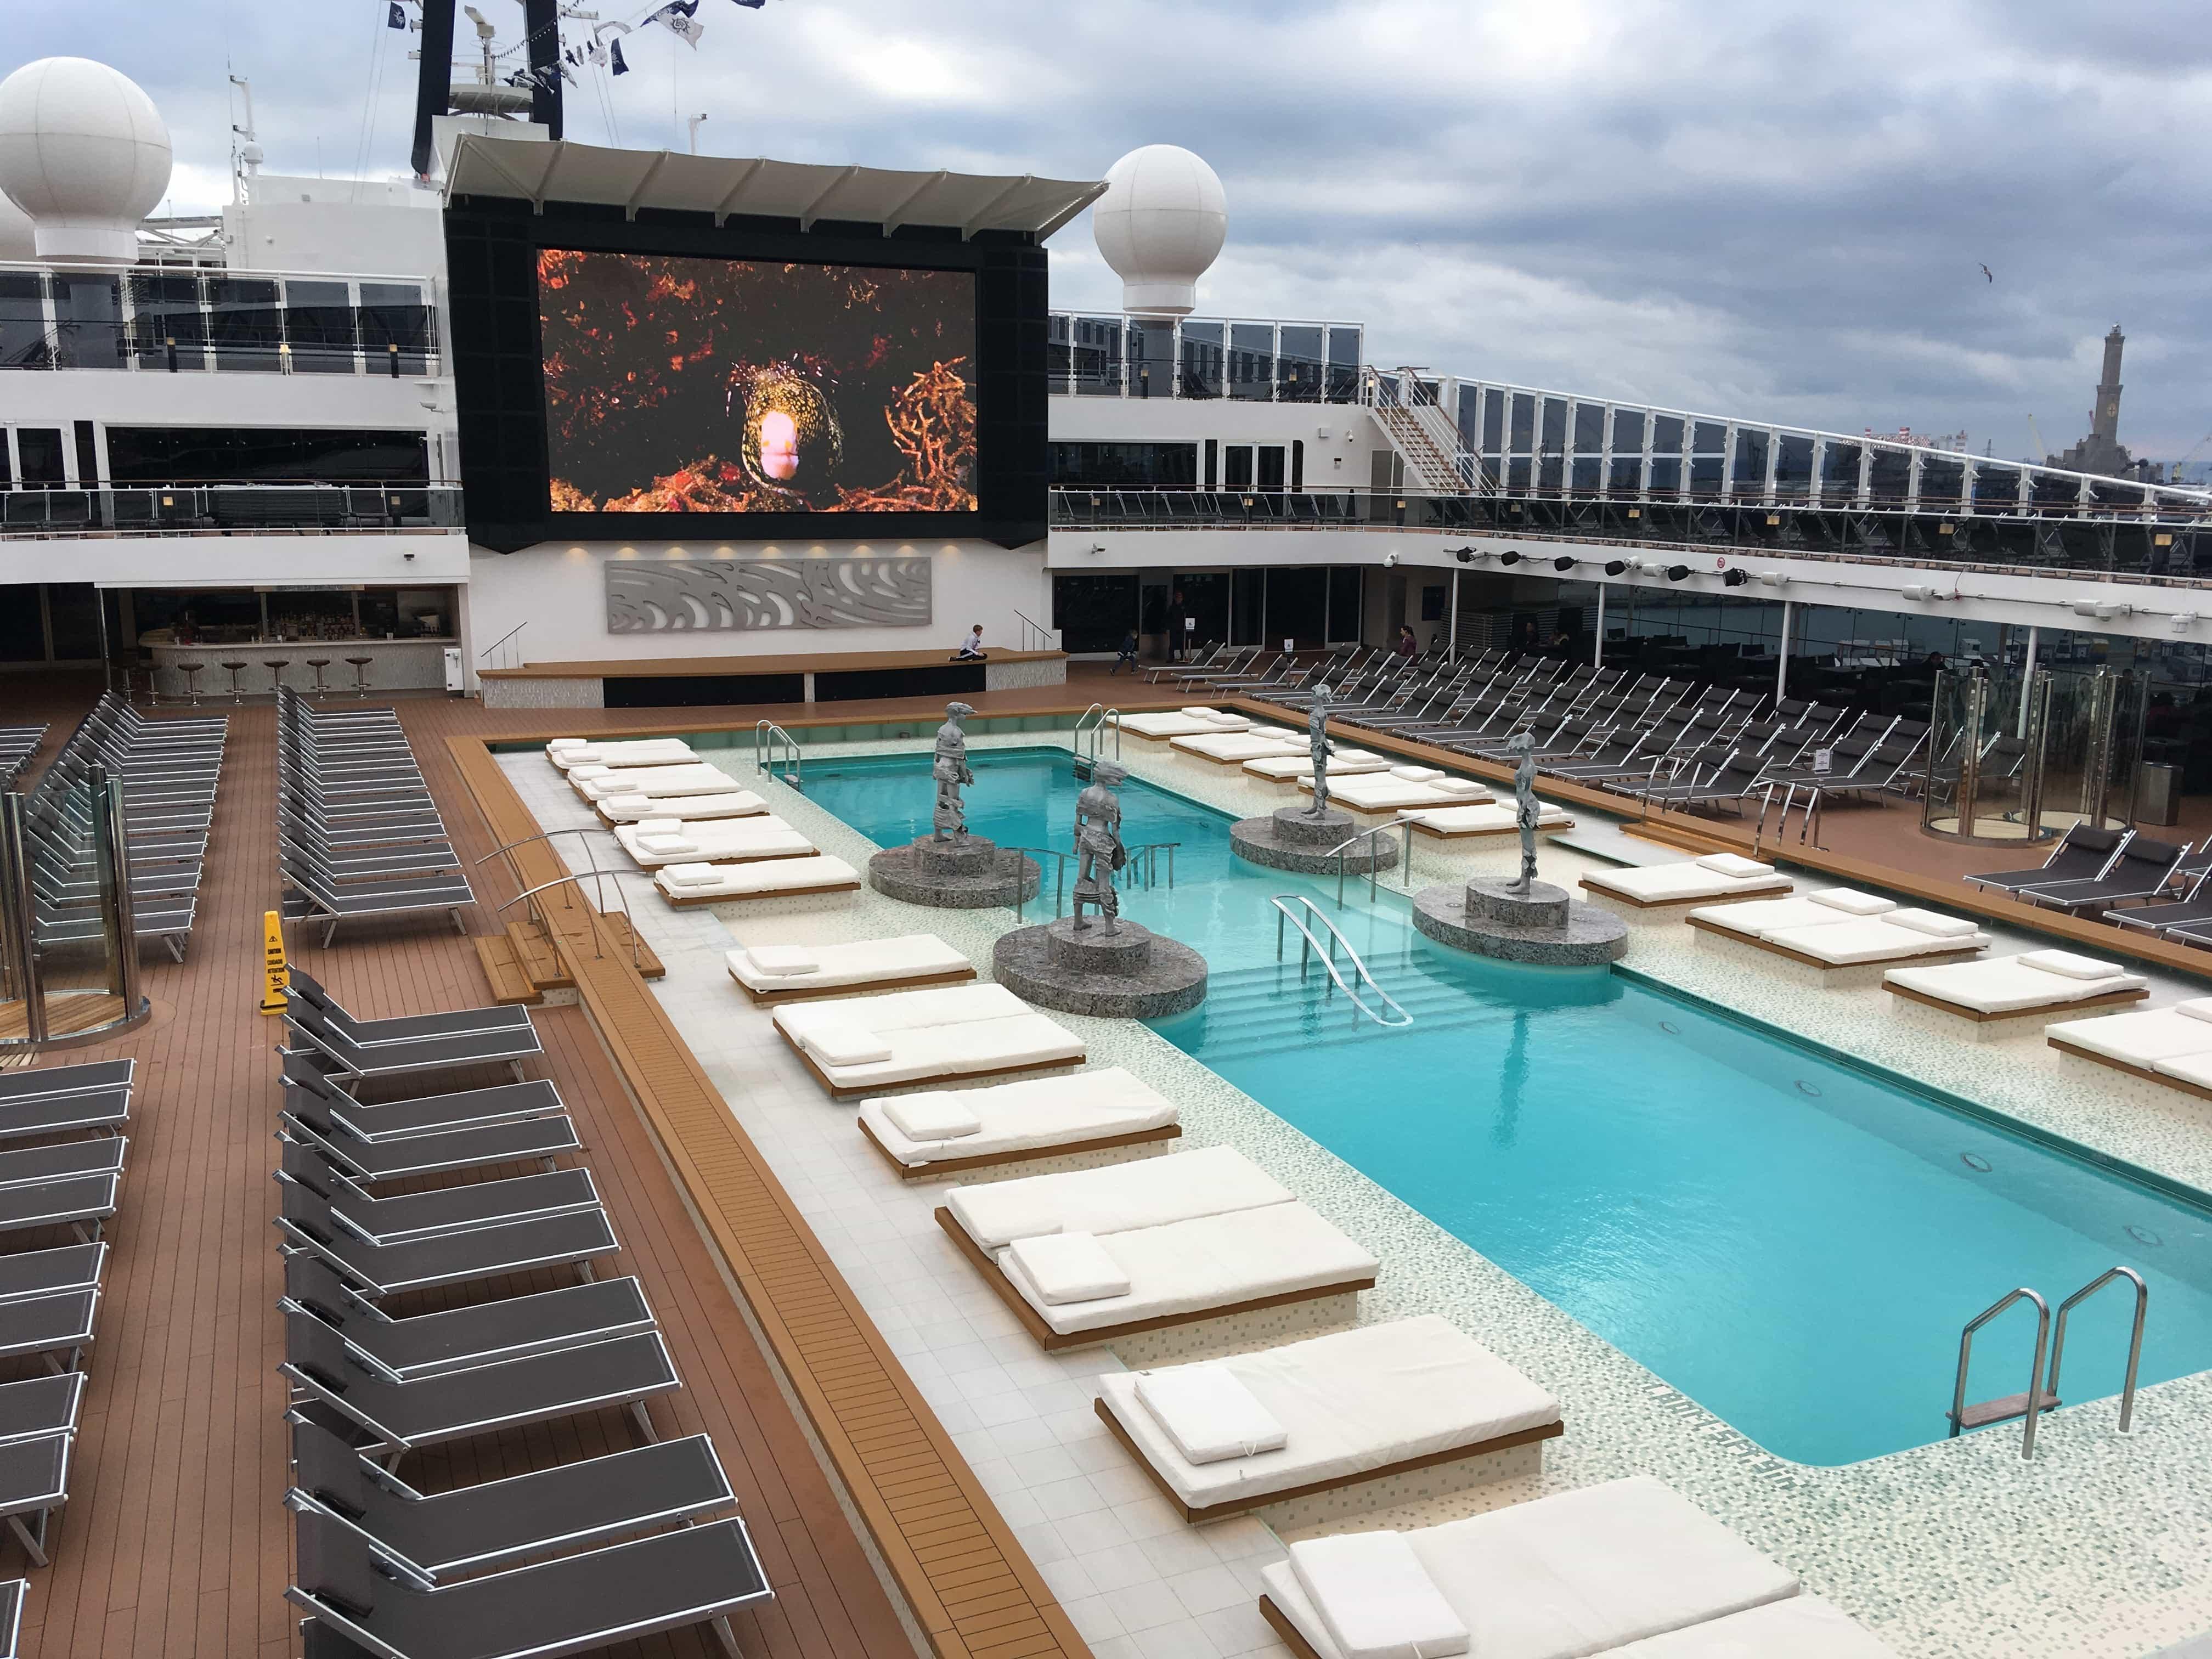 msc meraviglia pool deck top swimming pools sun loungers fish on screen